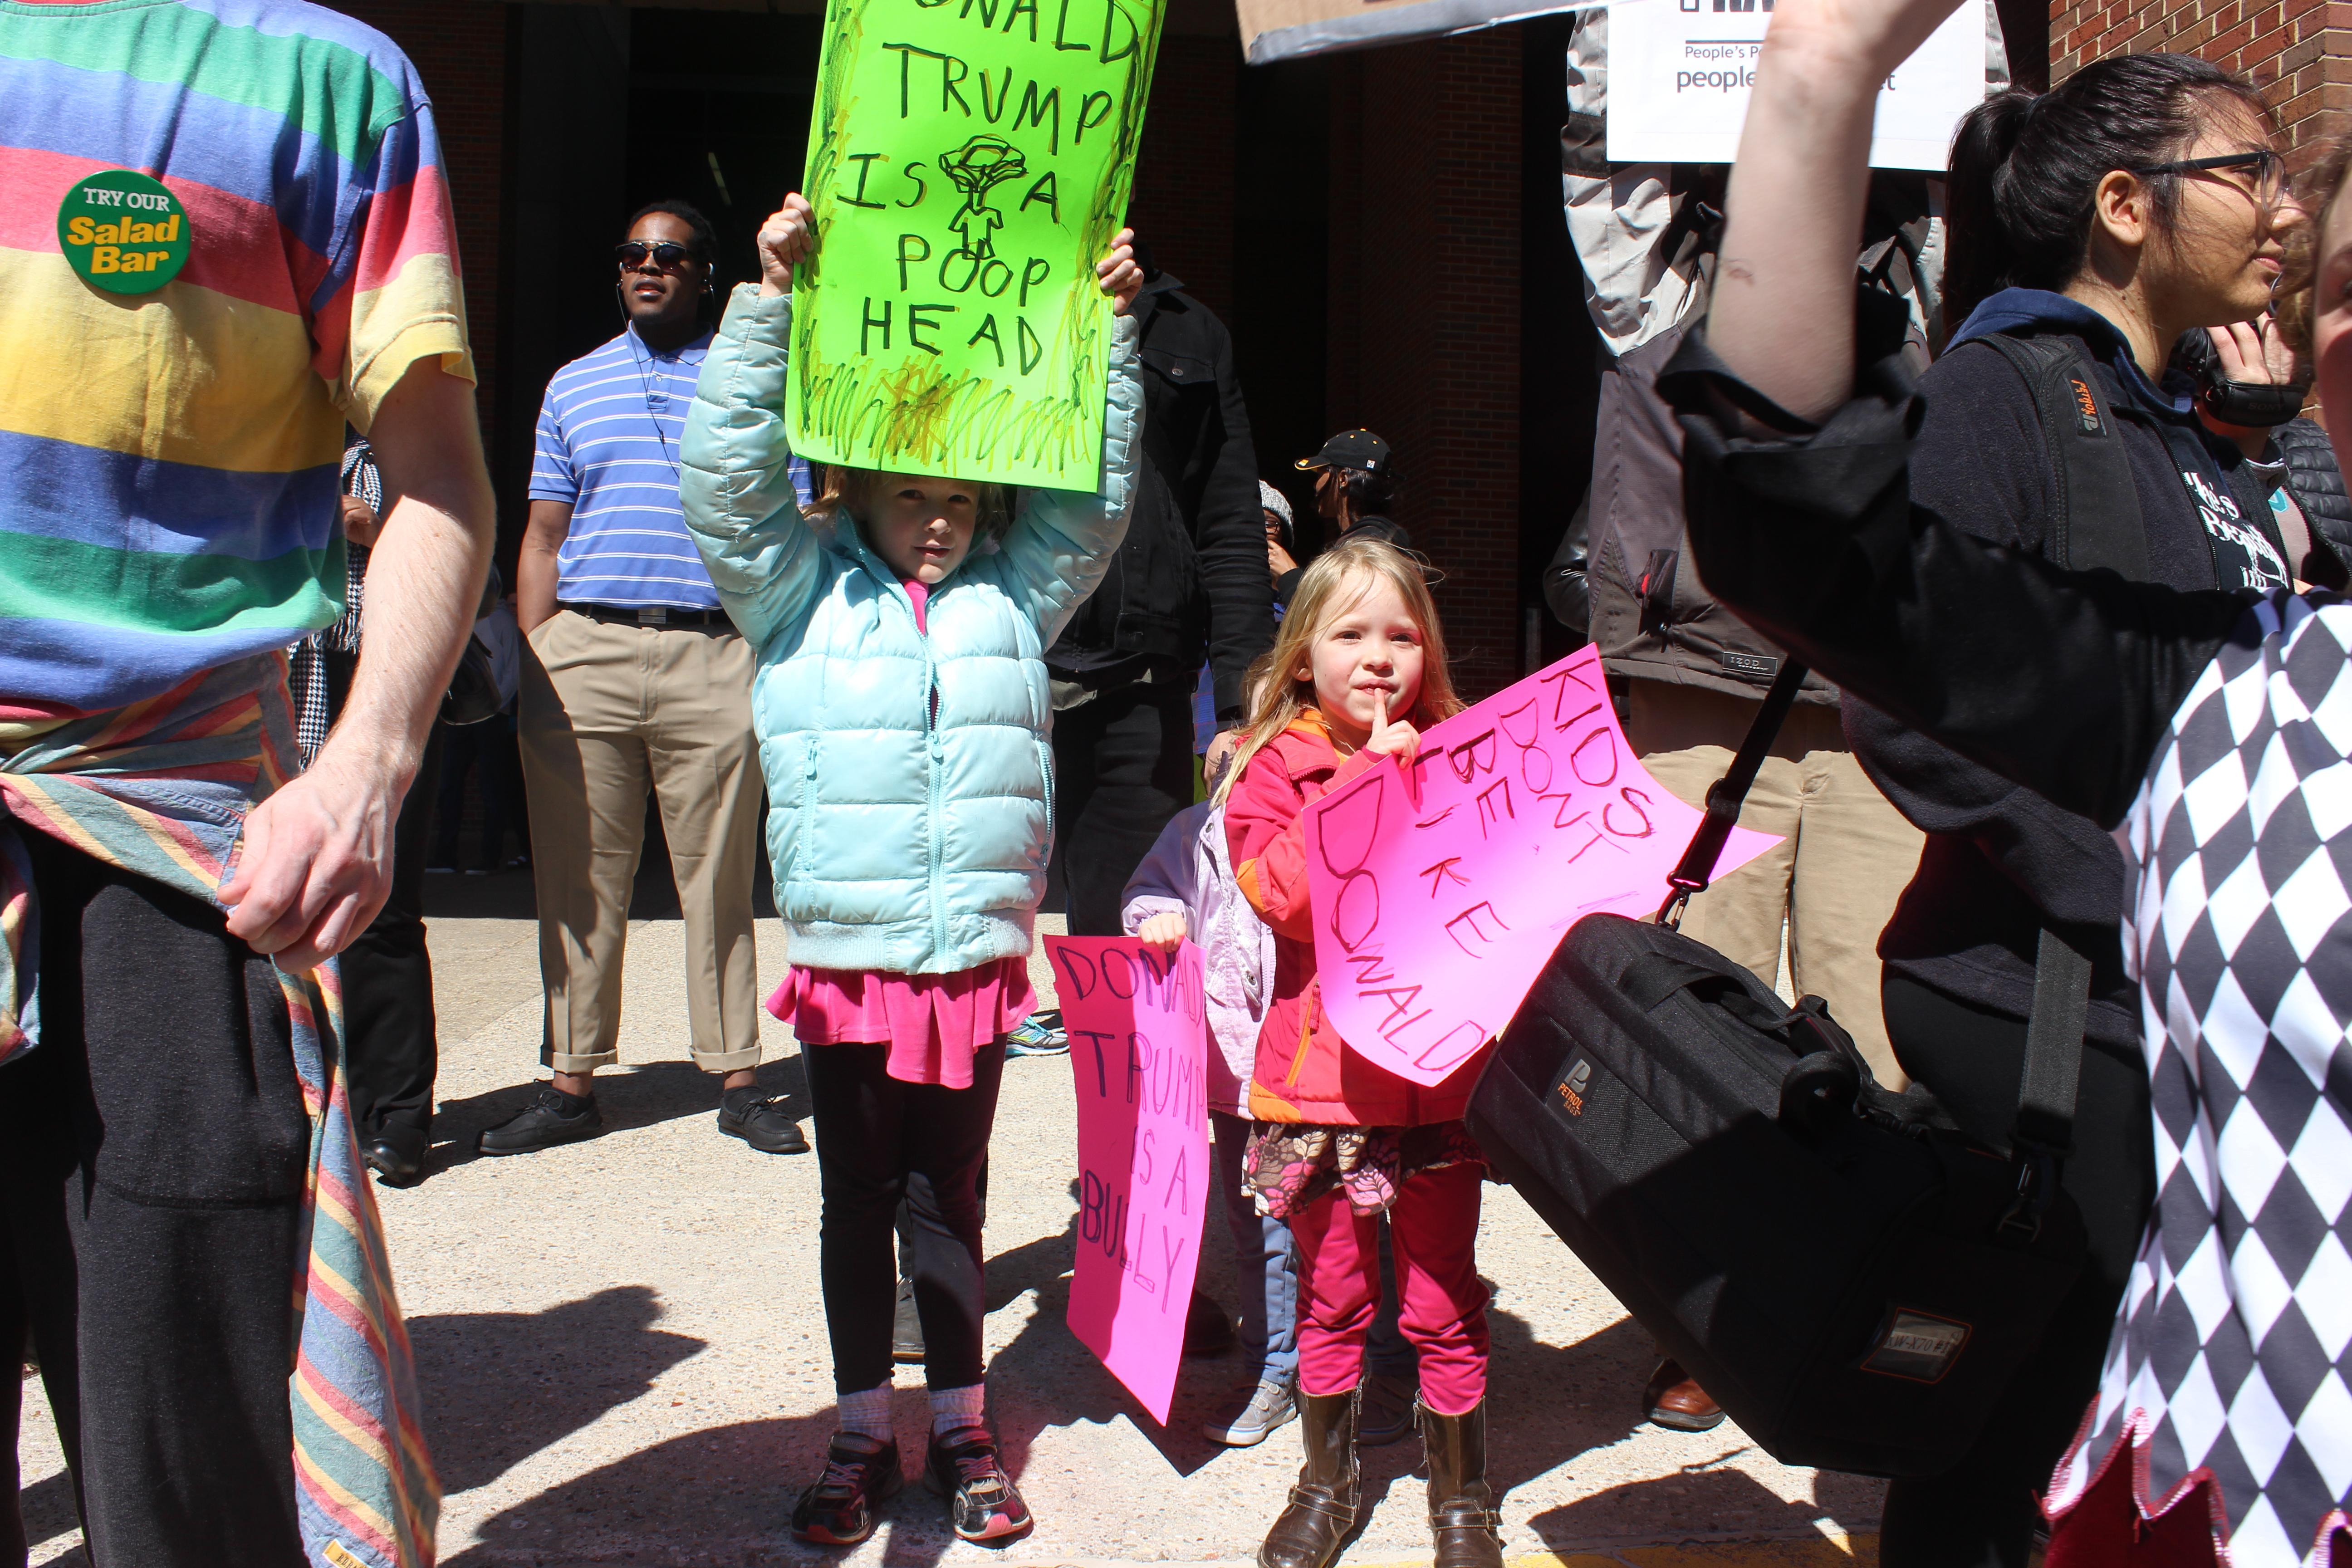 Children showed up to protest. Photo by Brandon Hartman.